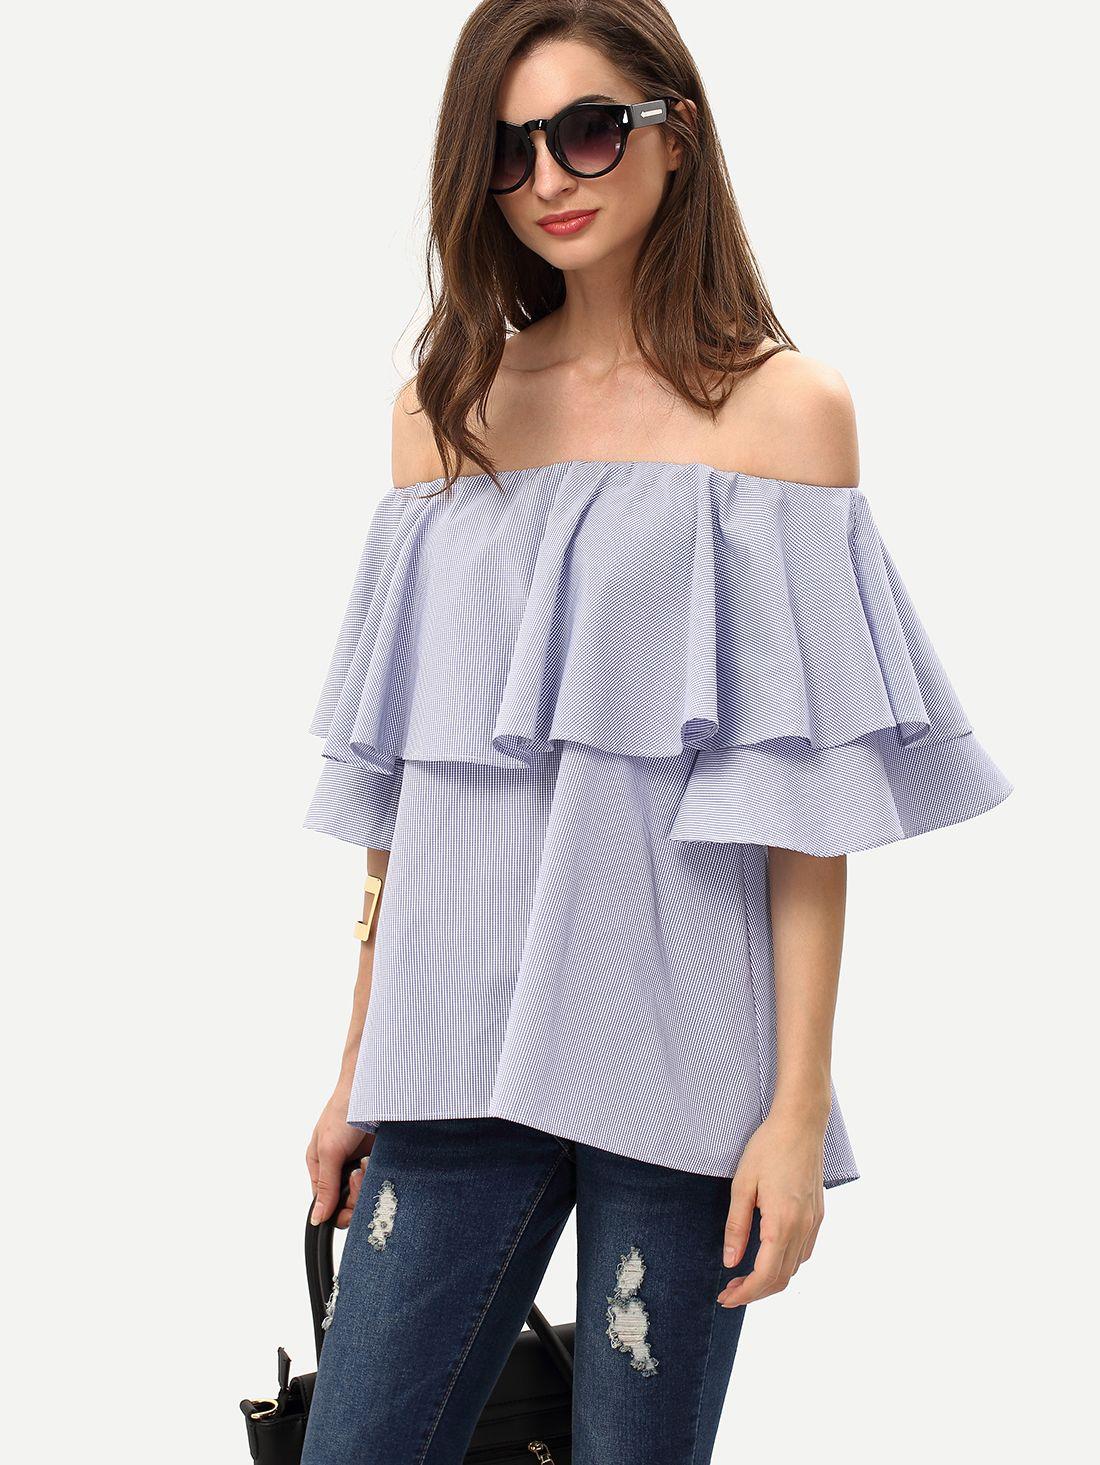 bdcb863f67186 Shop Royal Blue Ruffle Off The Shoulder Blouse online. SheIn offers Royal  Blue…